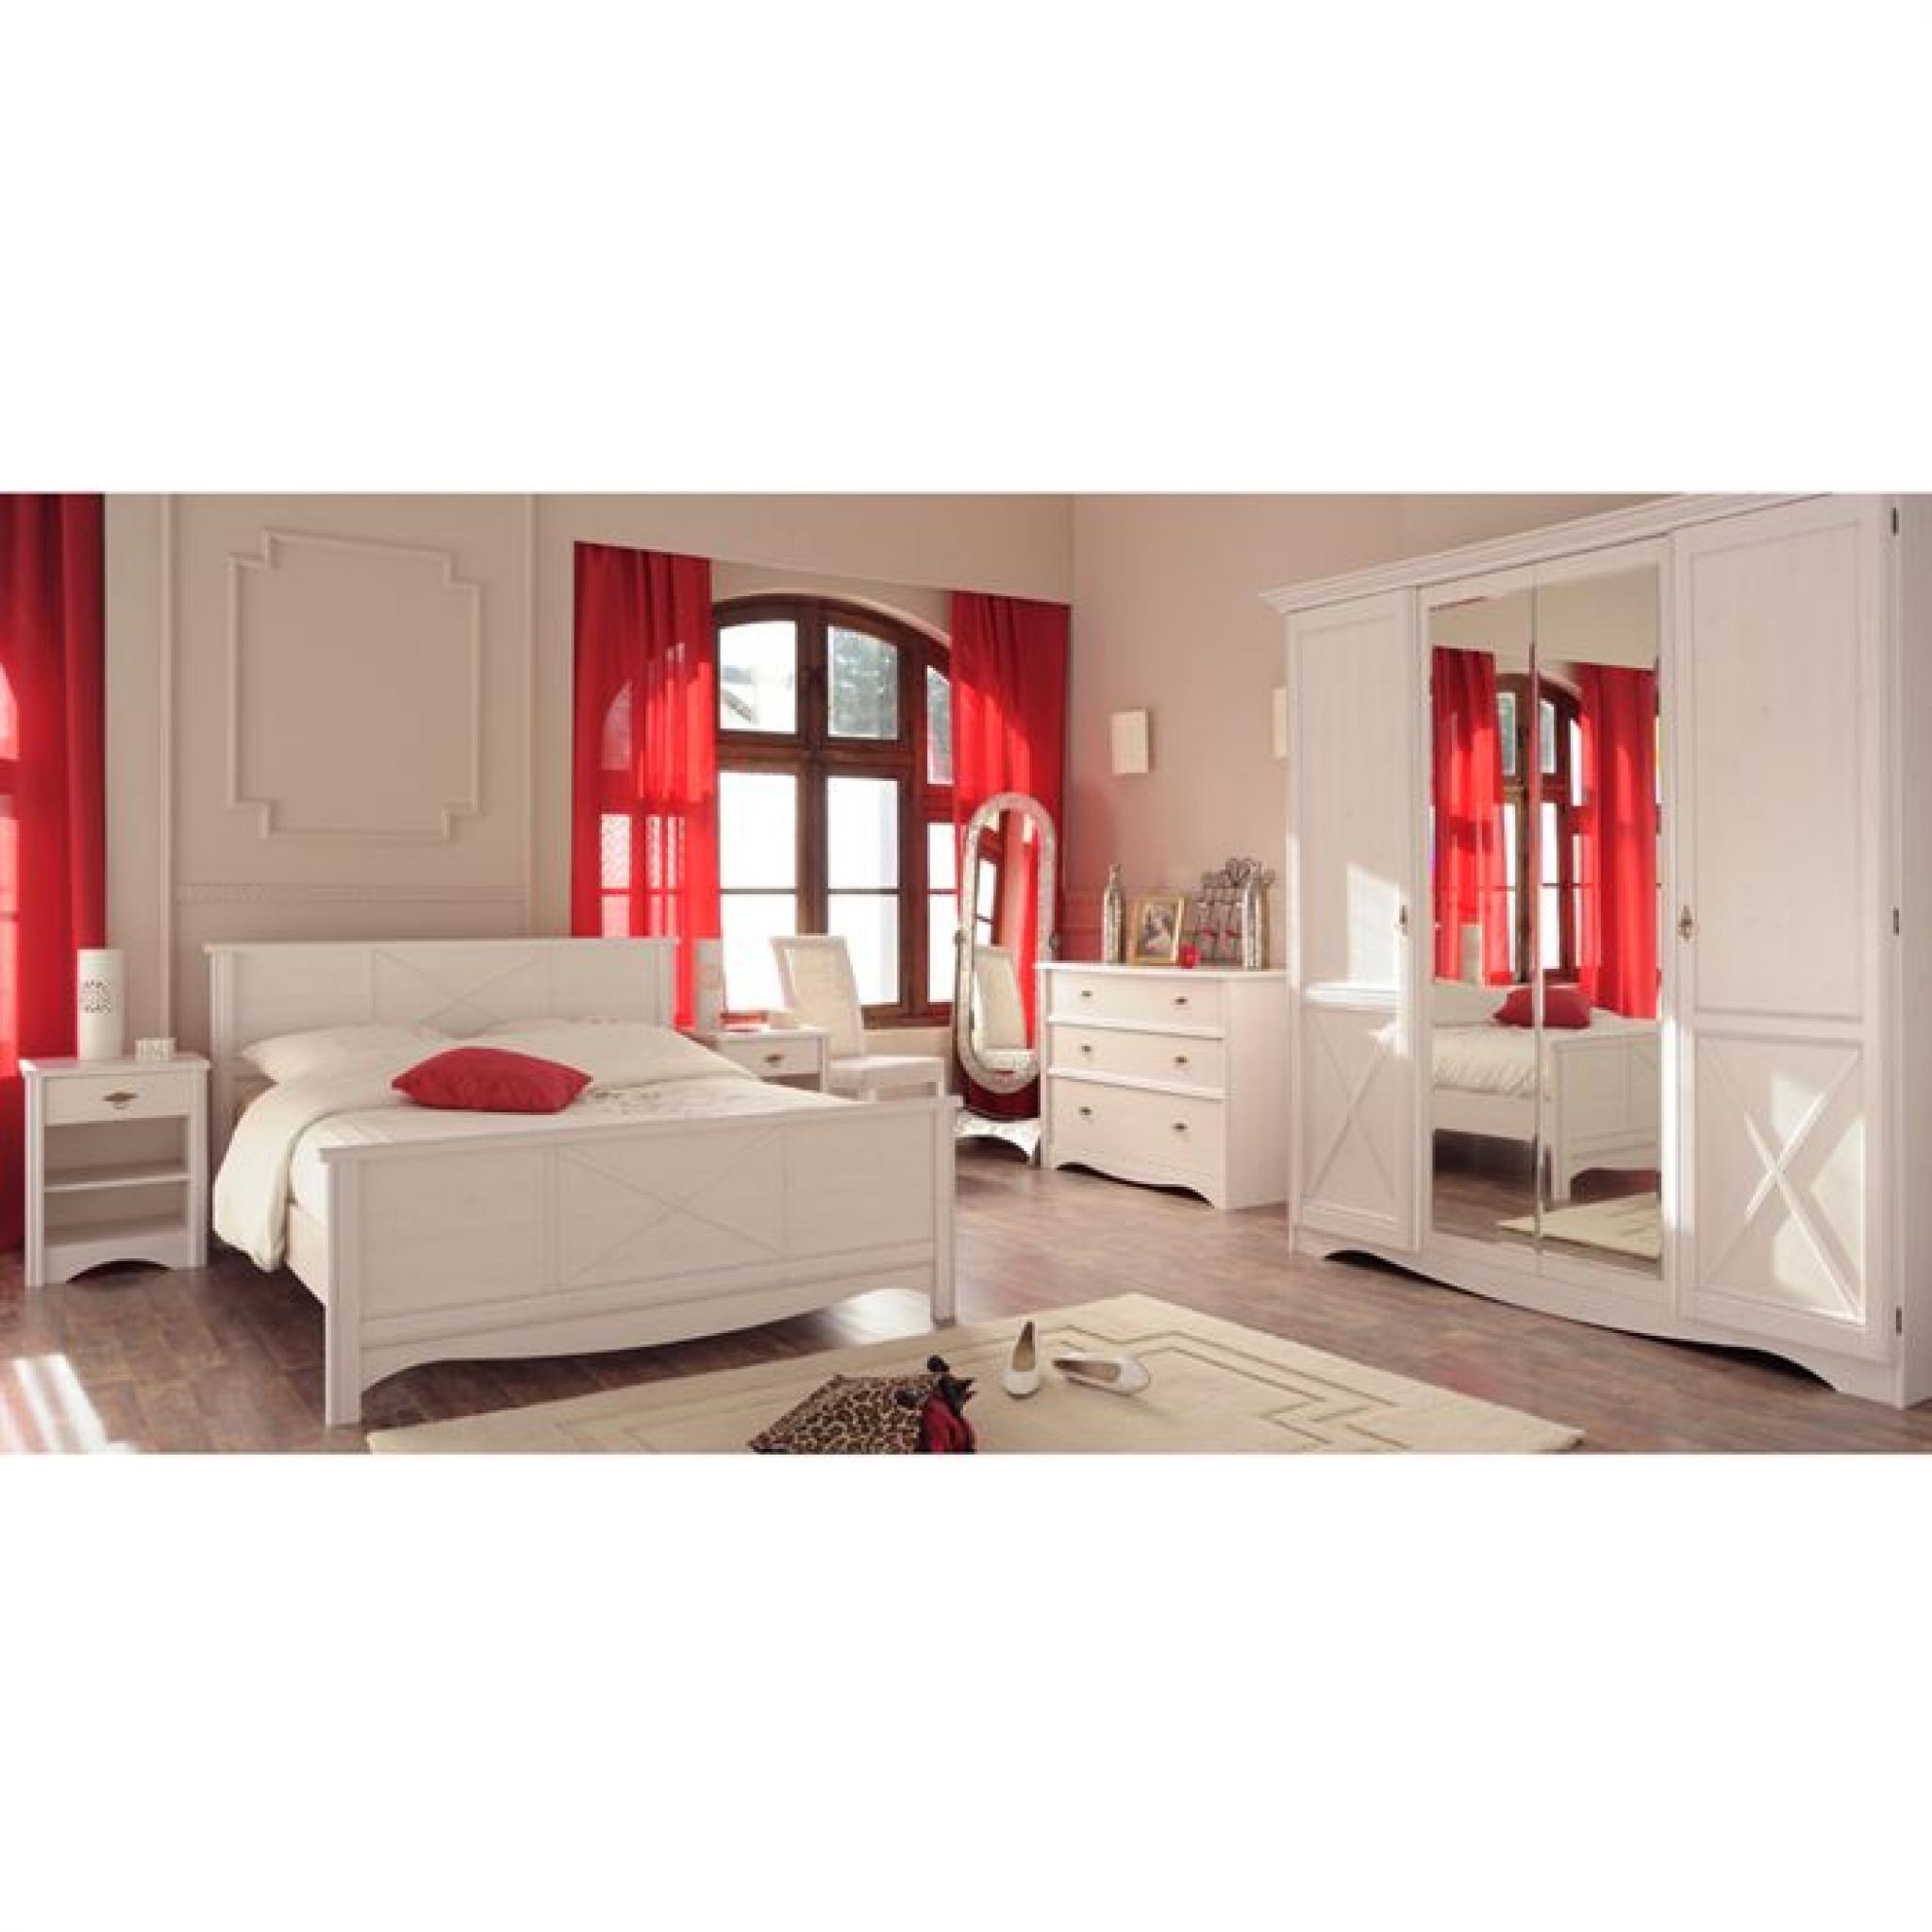 marine armoire 4 portes achat vente armoire de chambre. Black Bedroom Furniture Sets. Home Design Ideas